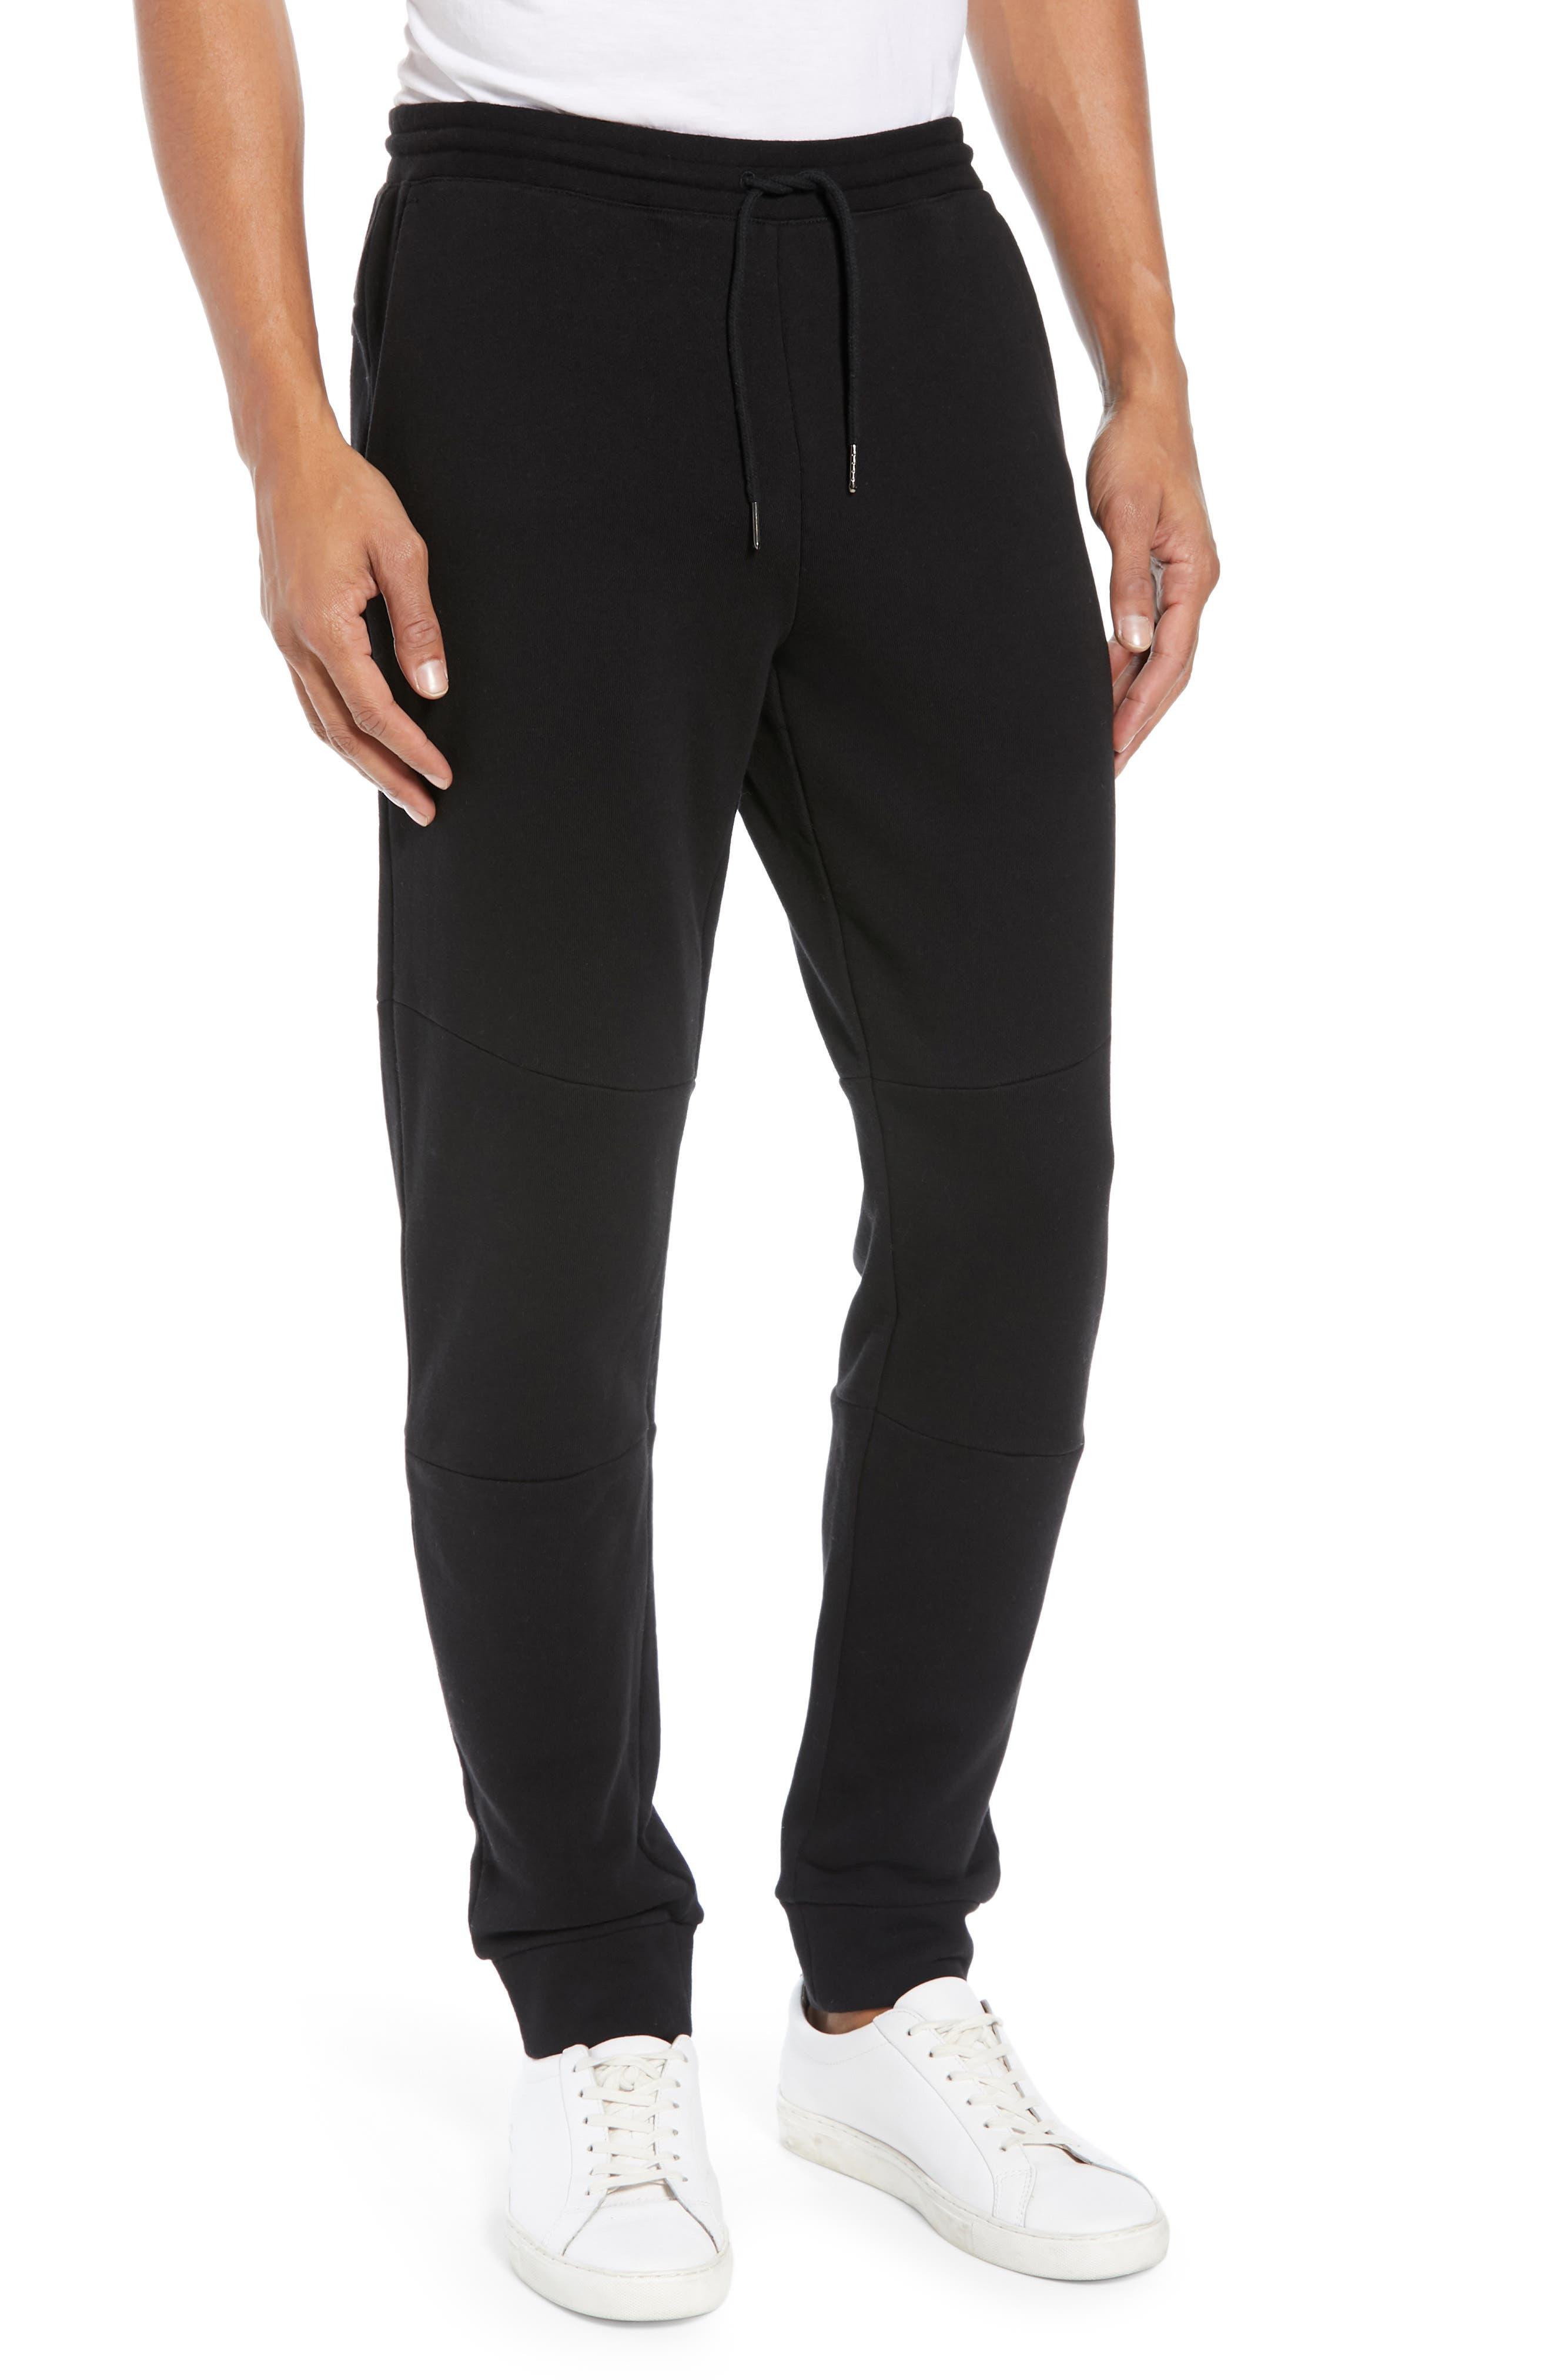 CLUB MONACO Articulated Seam Jogger Pants, Main, color, 001